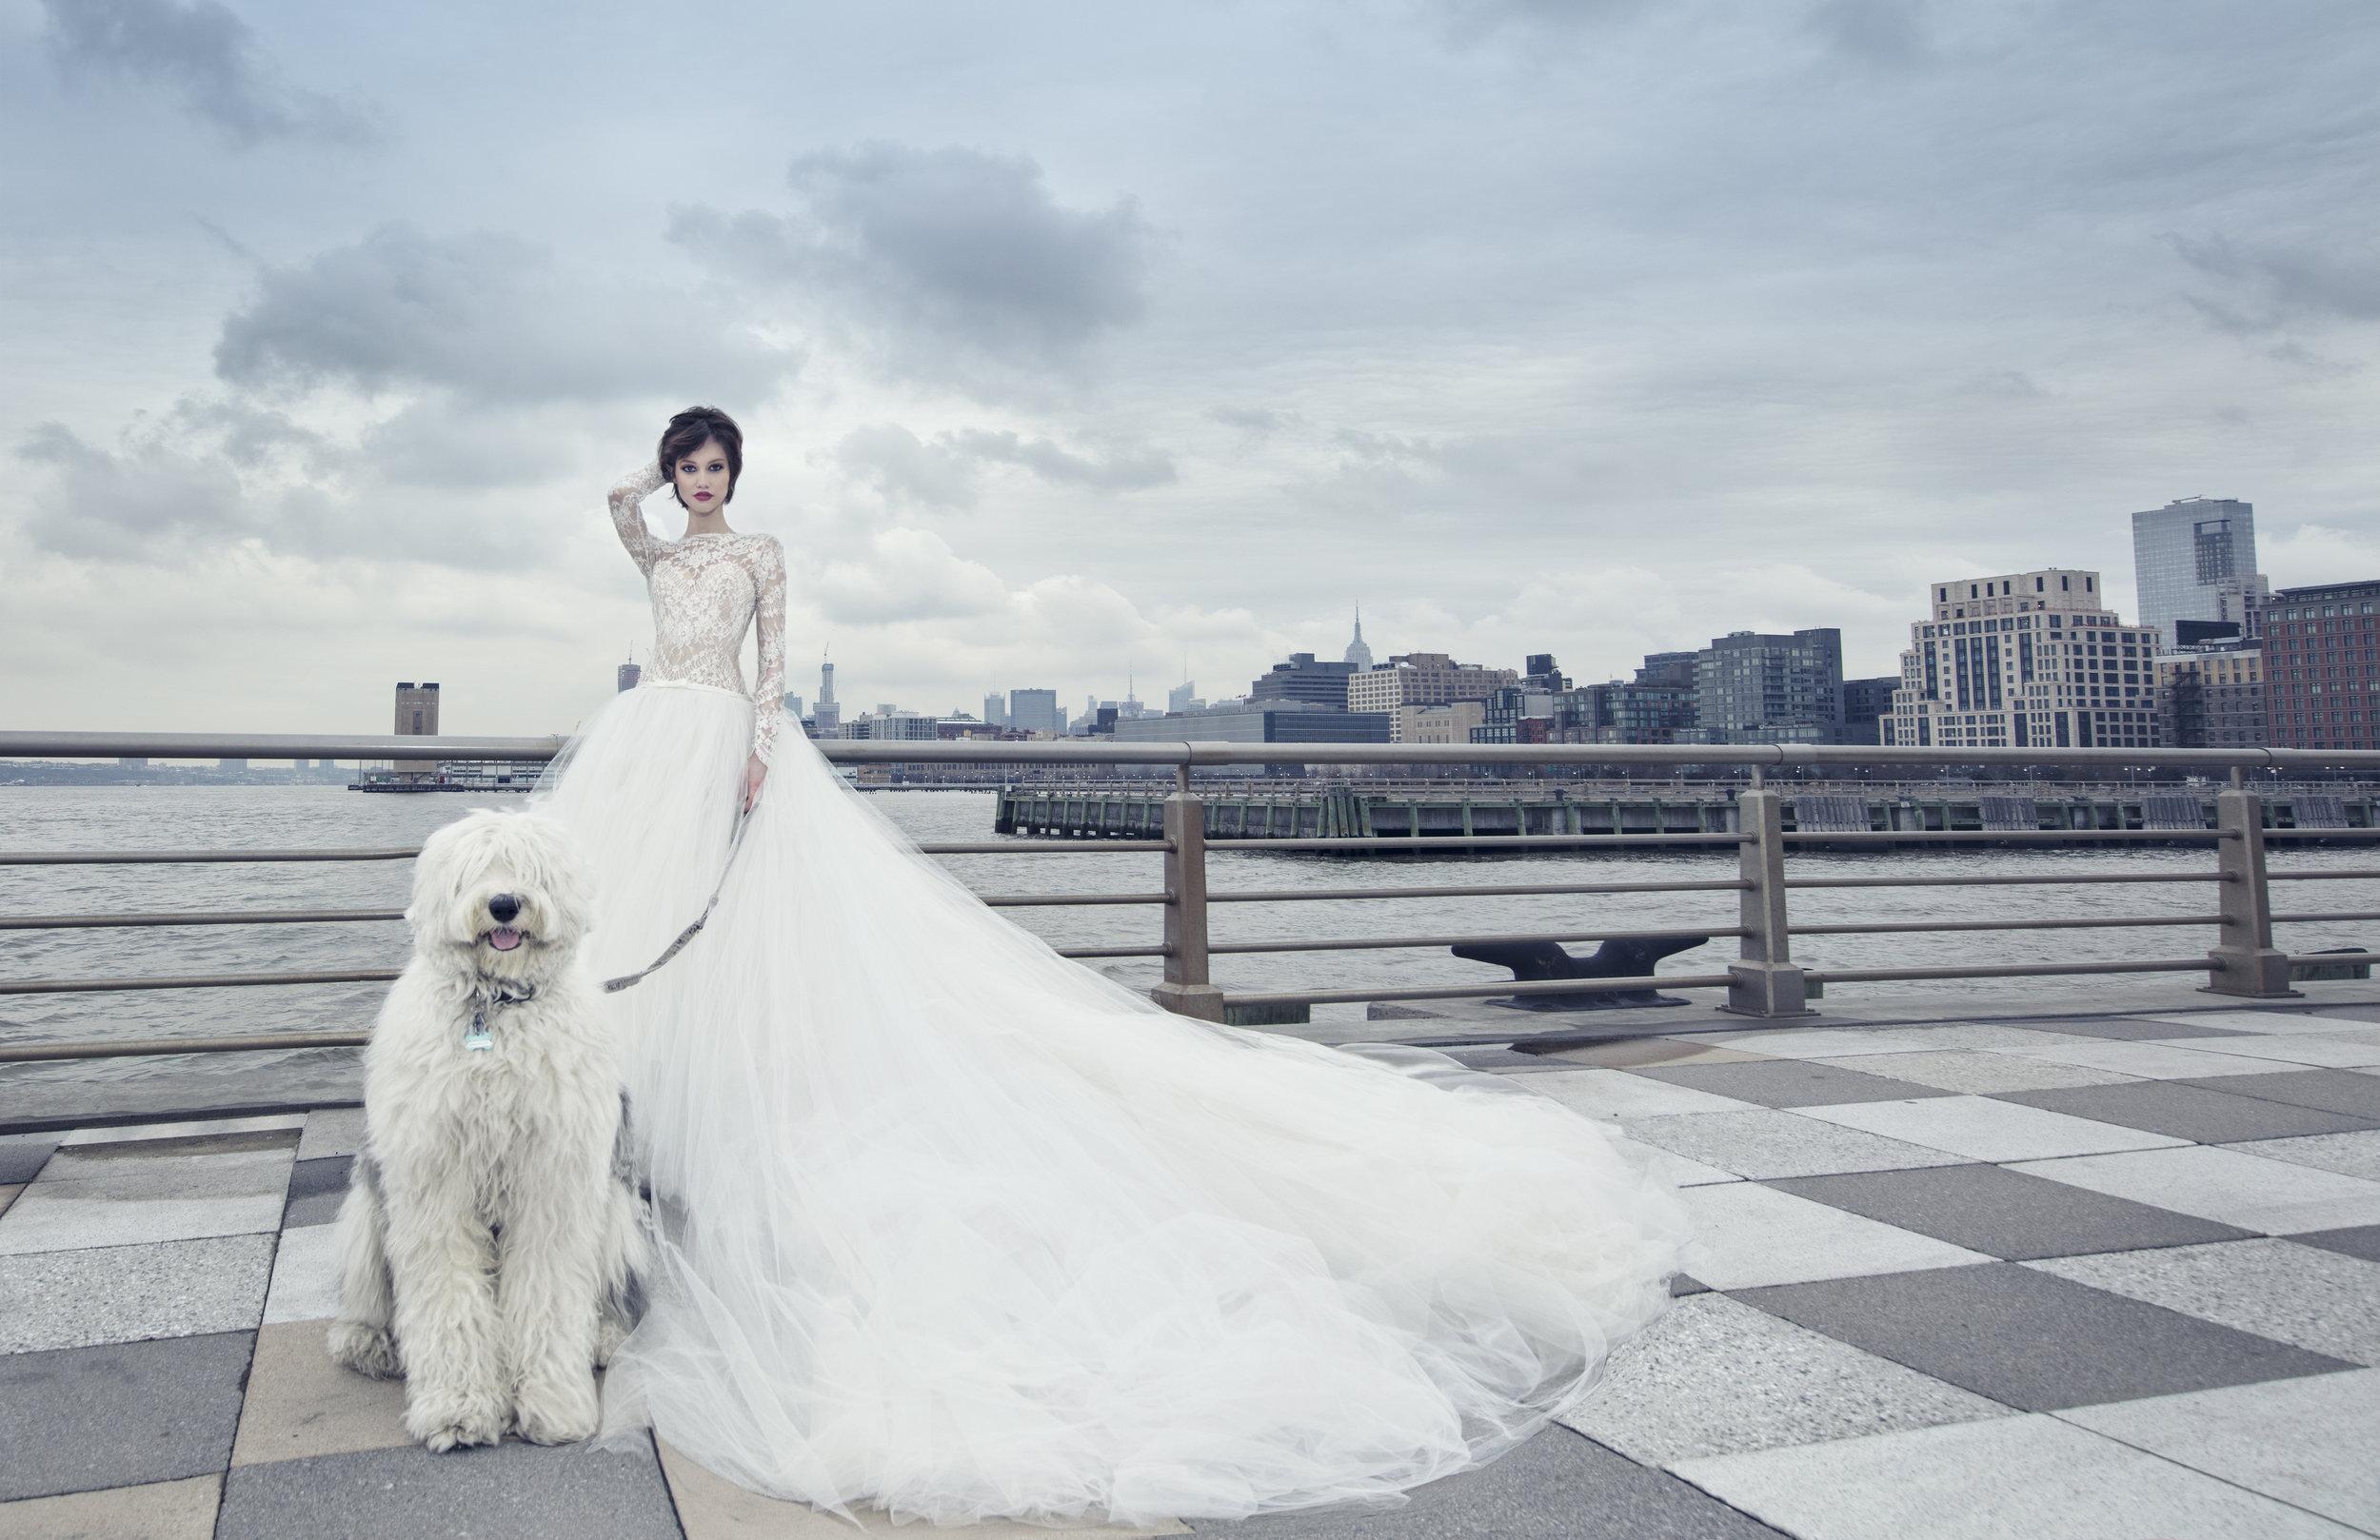 Bredice_Beauty_LYB_1_New York City 2018_Print Use_Zoe Christou Welsh.jpg